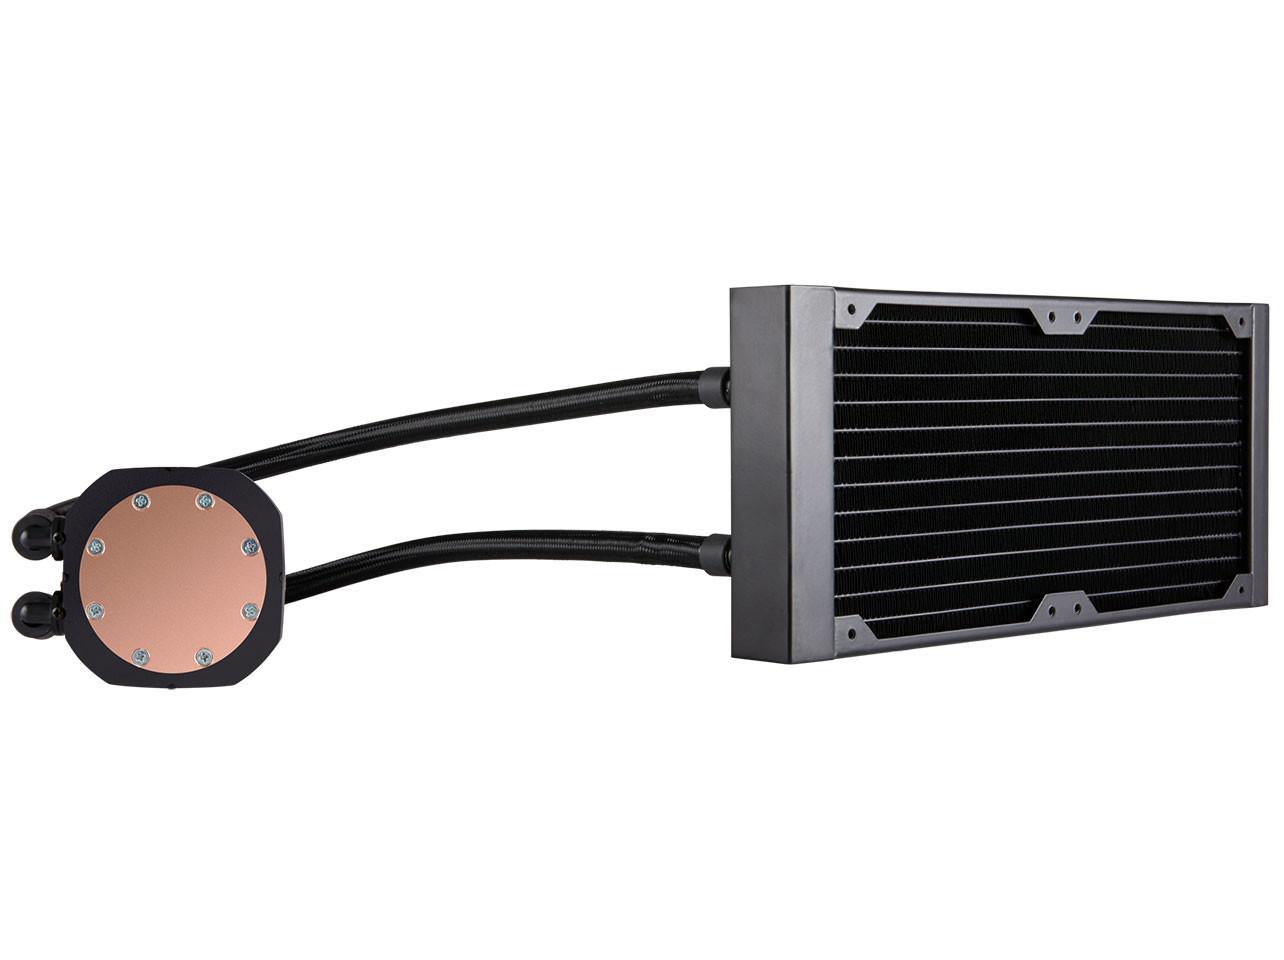 Corsair Launches New Hydro Series H100i Pro Liquid CPU Cooler